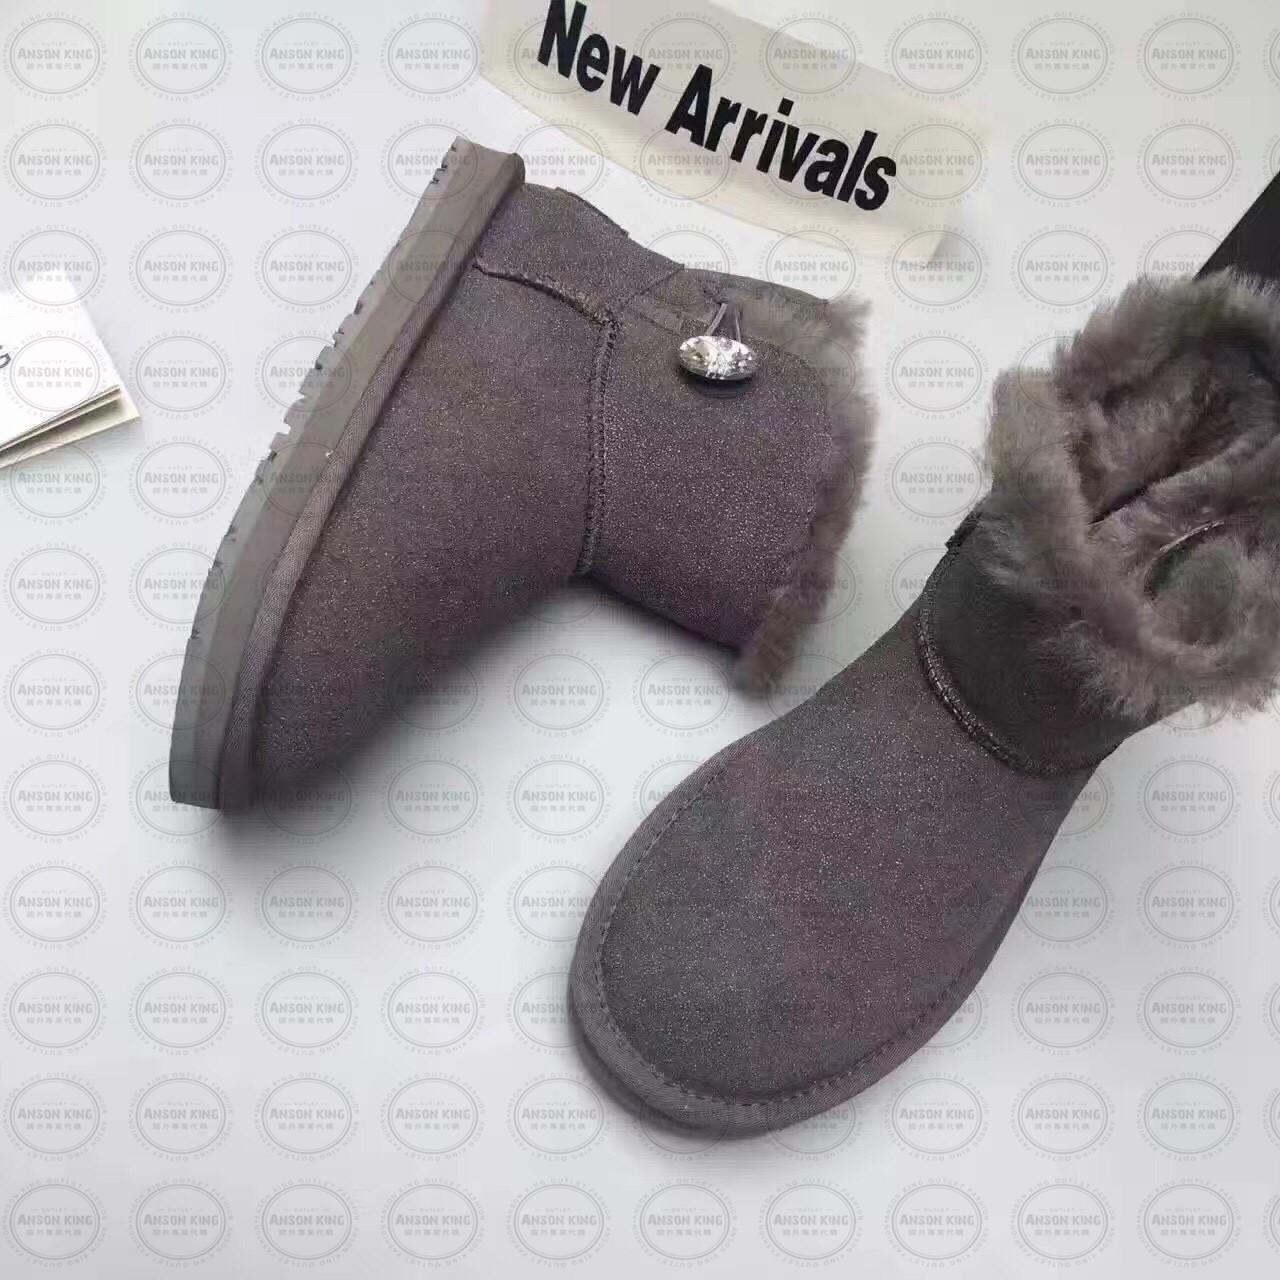 OUTLET正品代購 澳洲 UGG 明星同款水晶扣短靴 保暖 真皮羊皮毛 雪靴 短靴 灰色